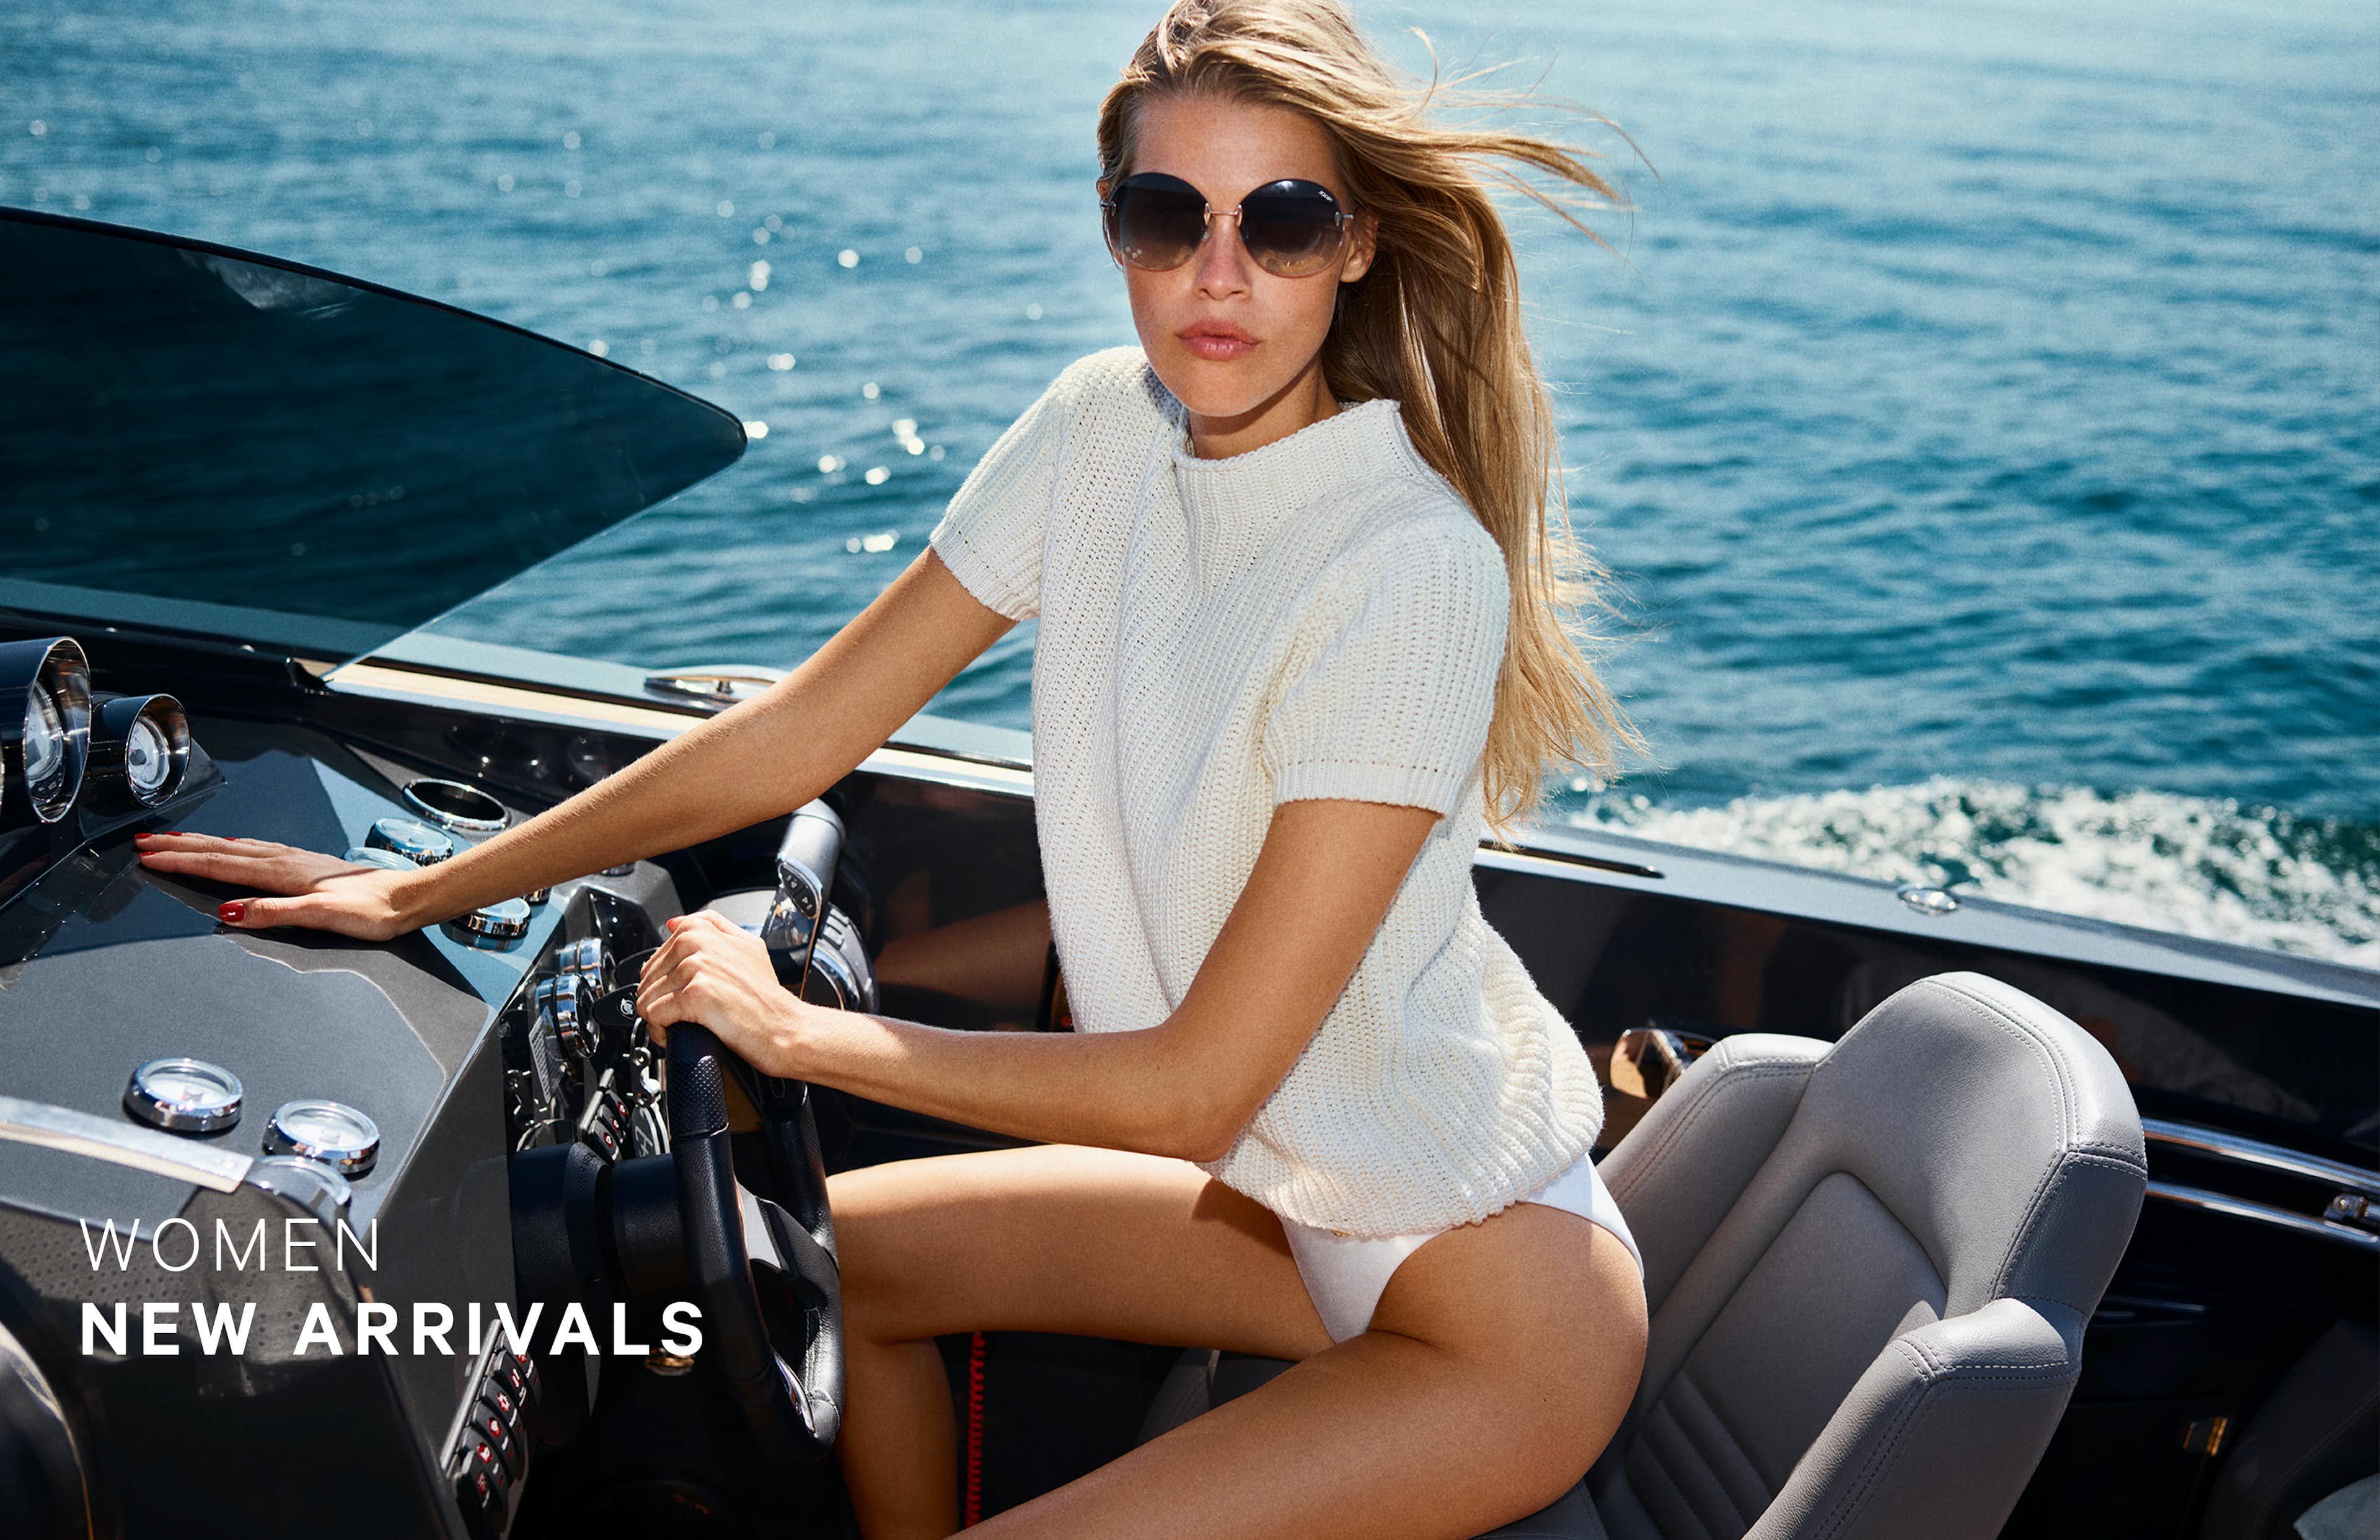 Frau in sommerlichem JOOP! Outfit auf Boot